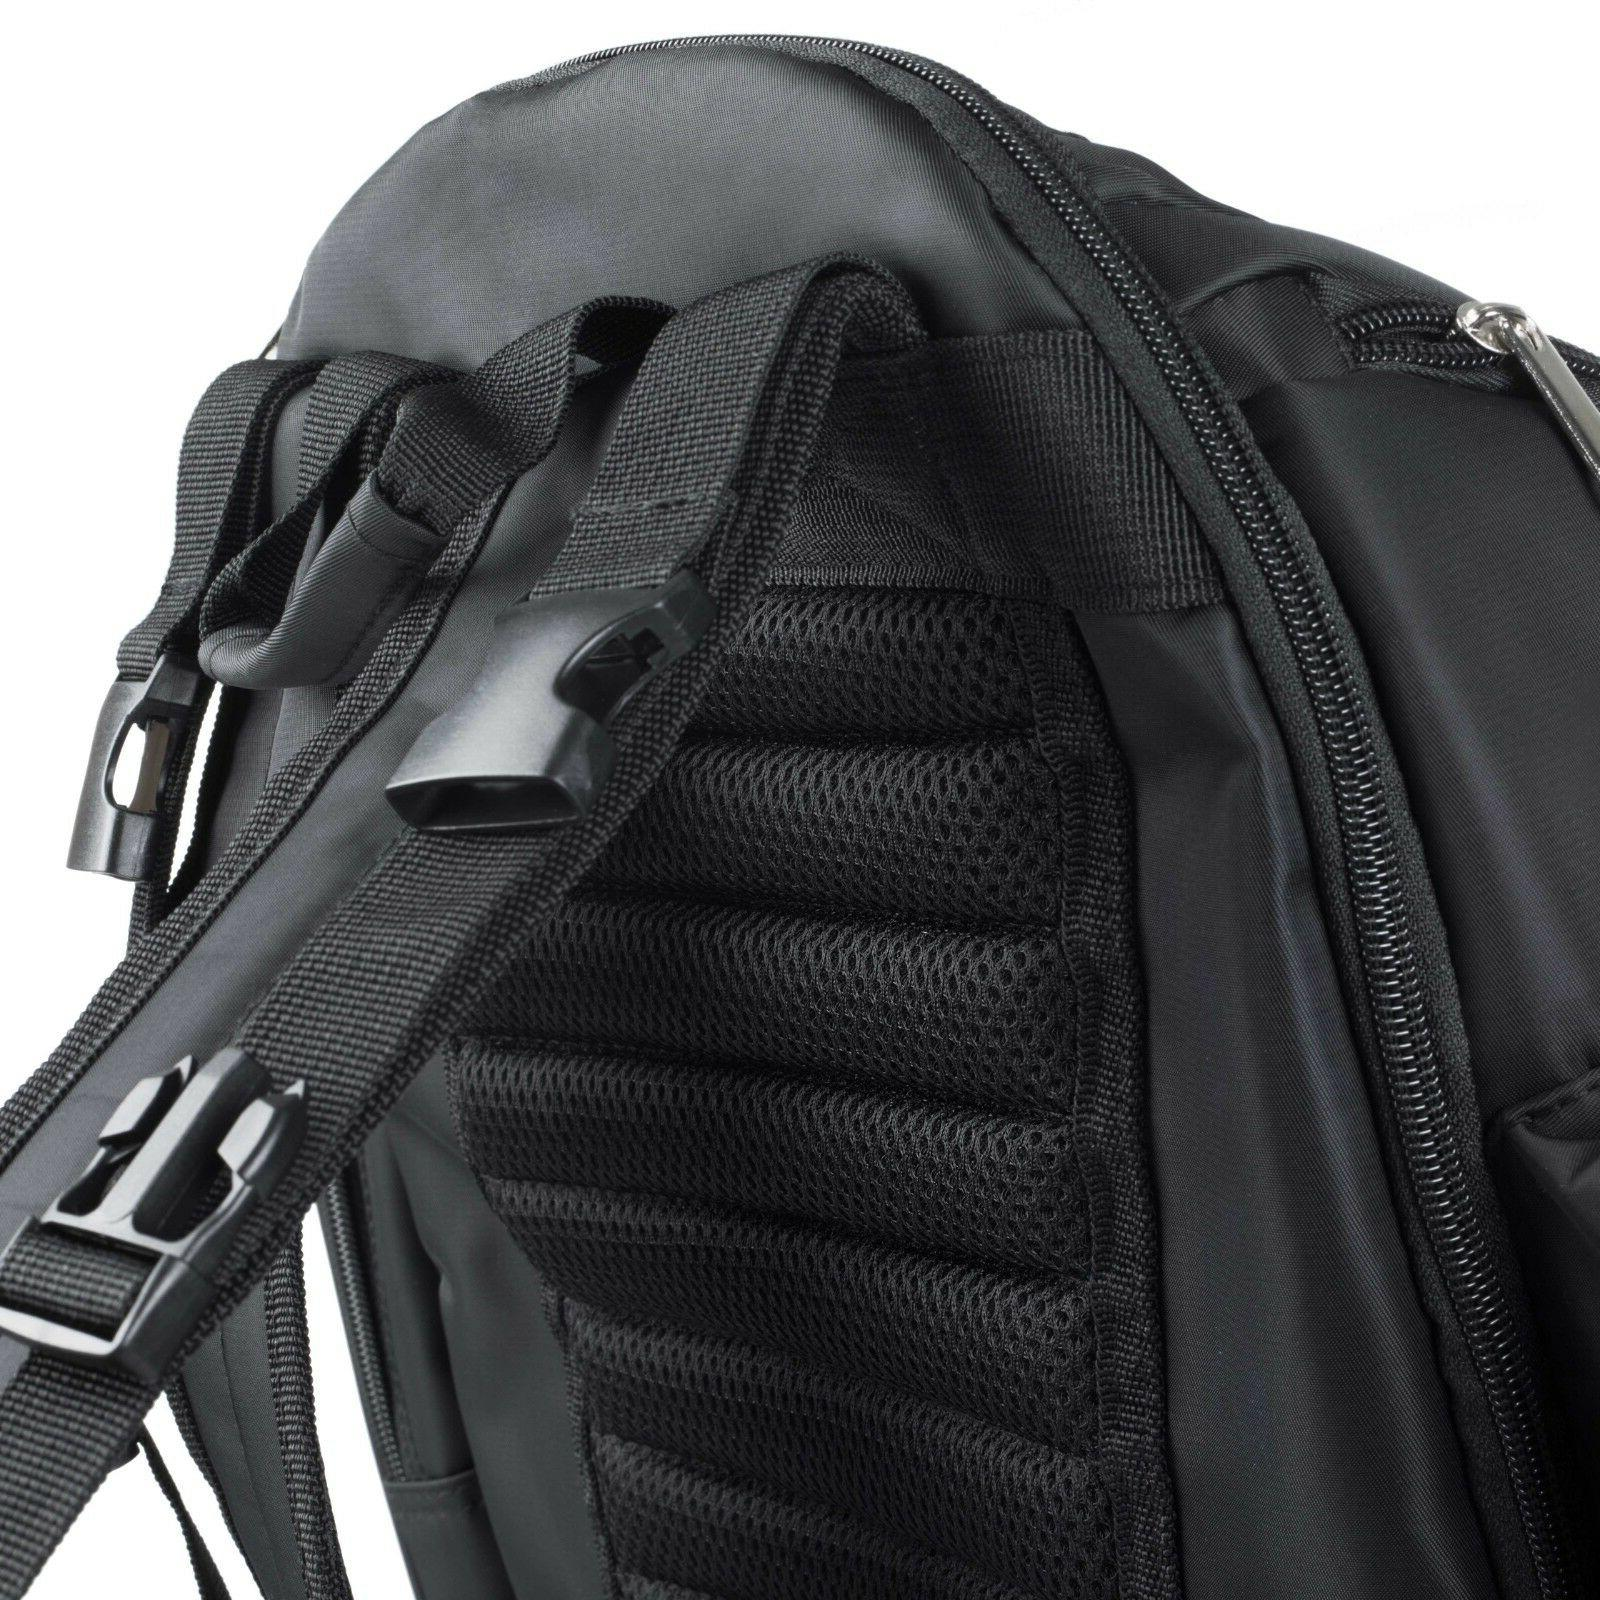 Diaper Backpack Straps, Wipes Dispenser.